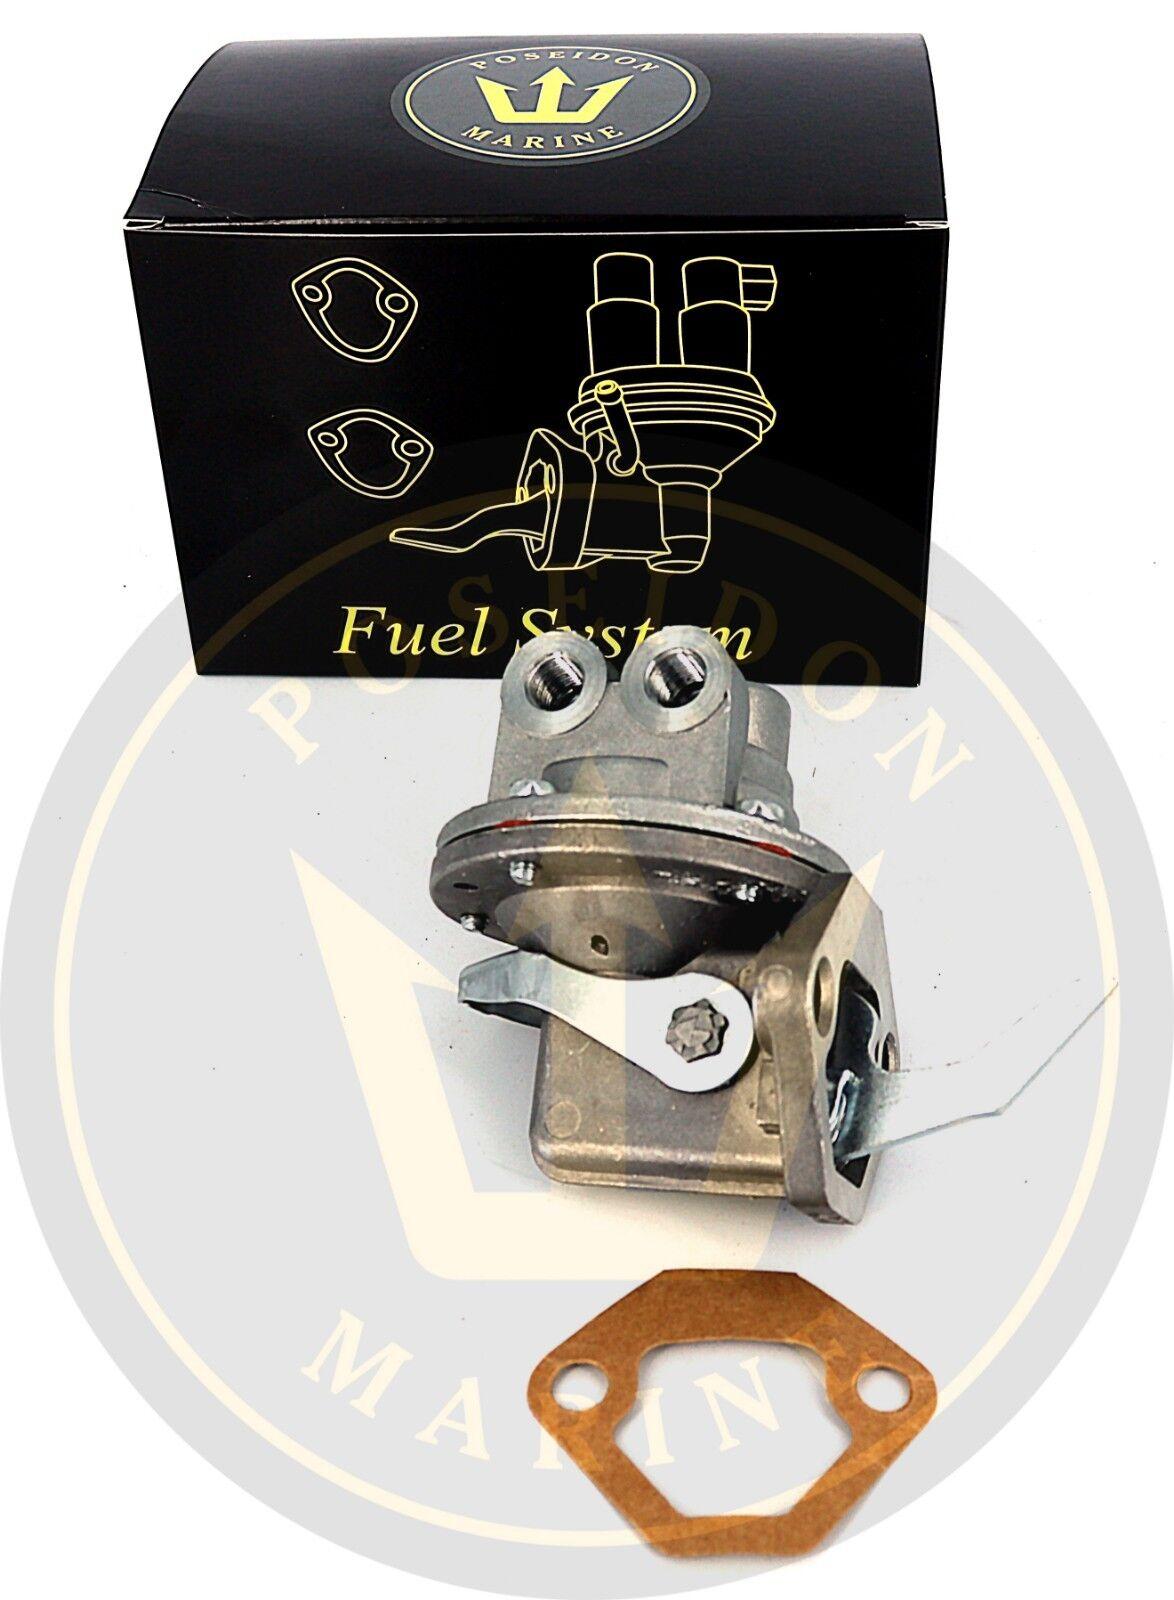 Fuel pump for Solé Sole diesel RO: 13414001